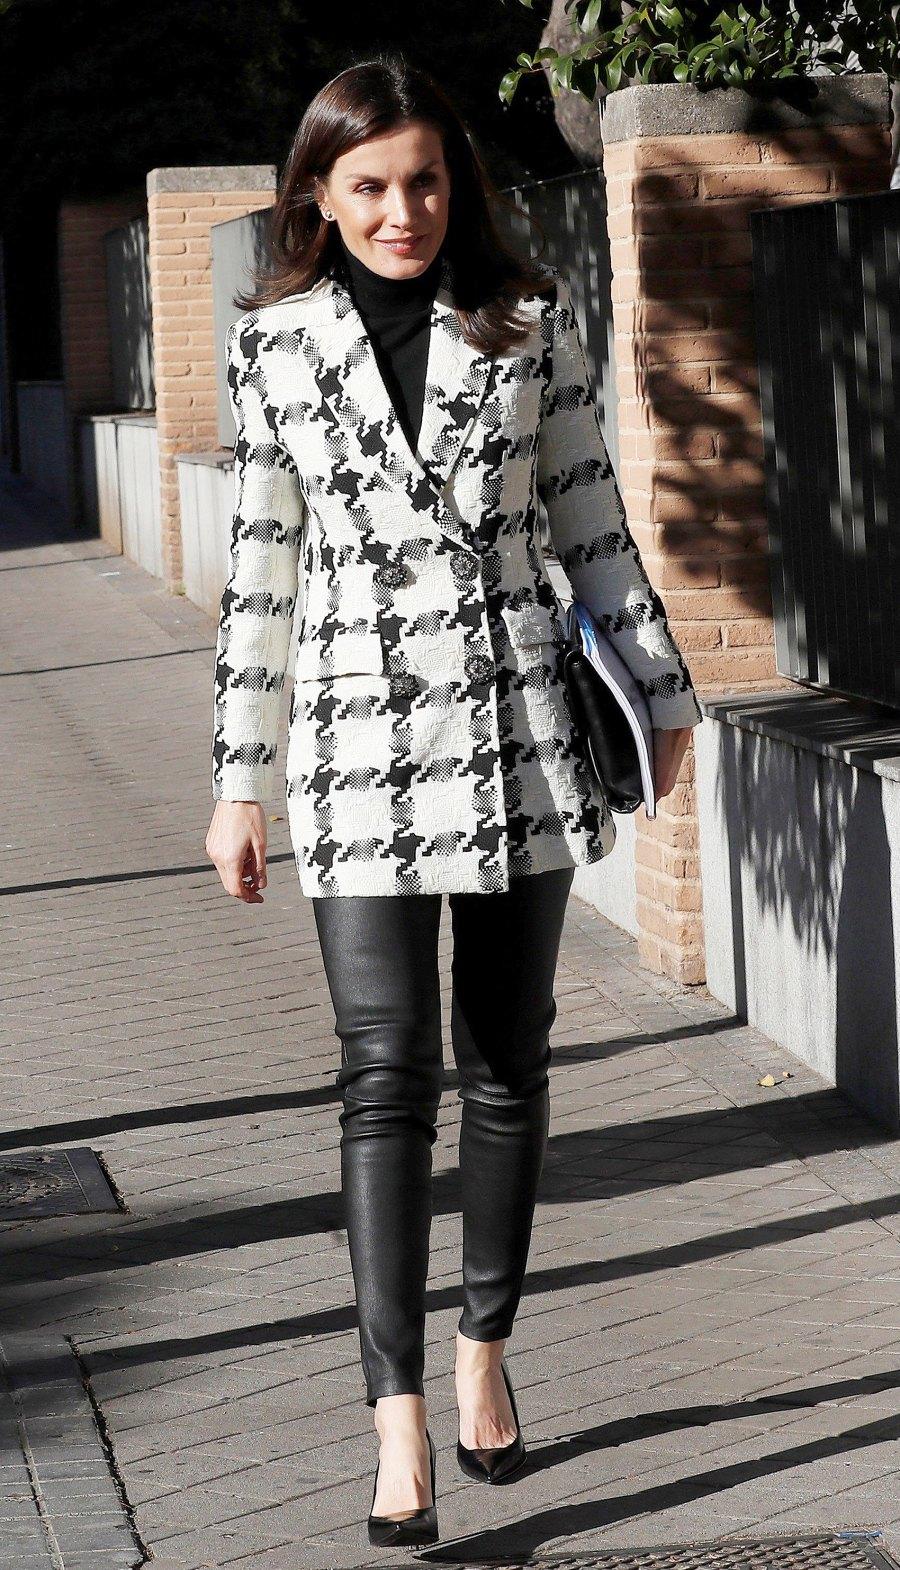 Queen Letizia Houndstooth Blazer January 9, 2020